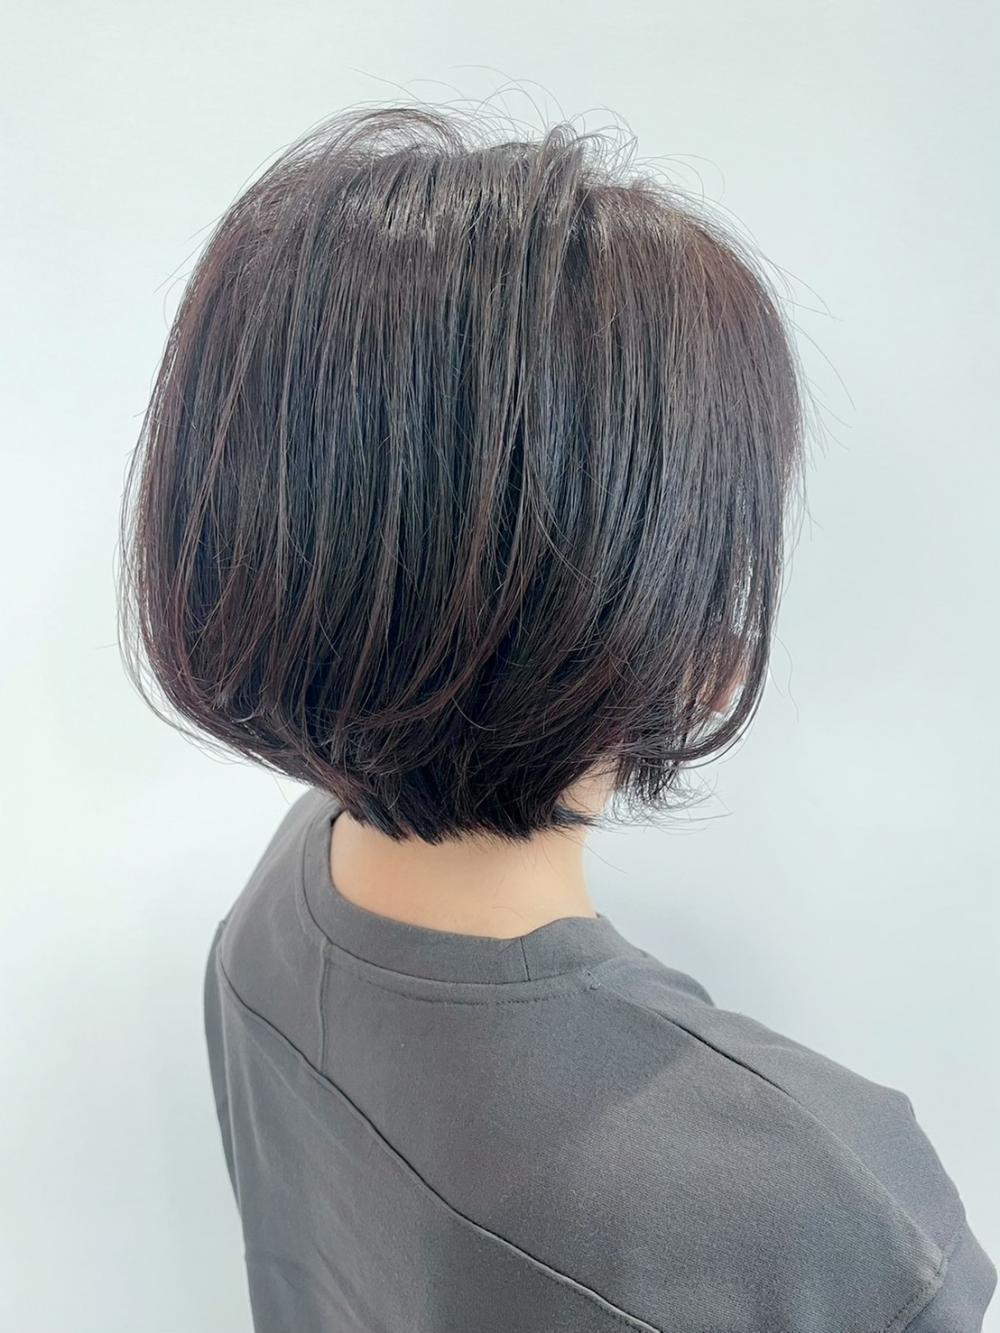 【feliceMICHI浅野祐輔】ショートグレイカラー